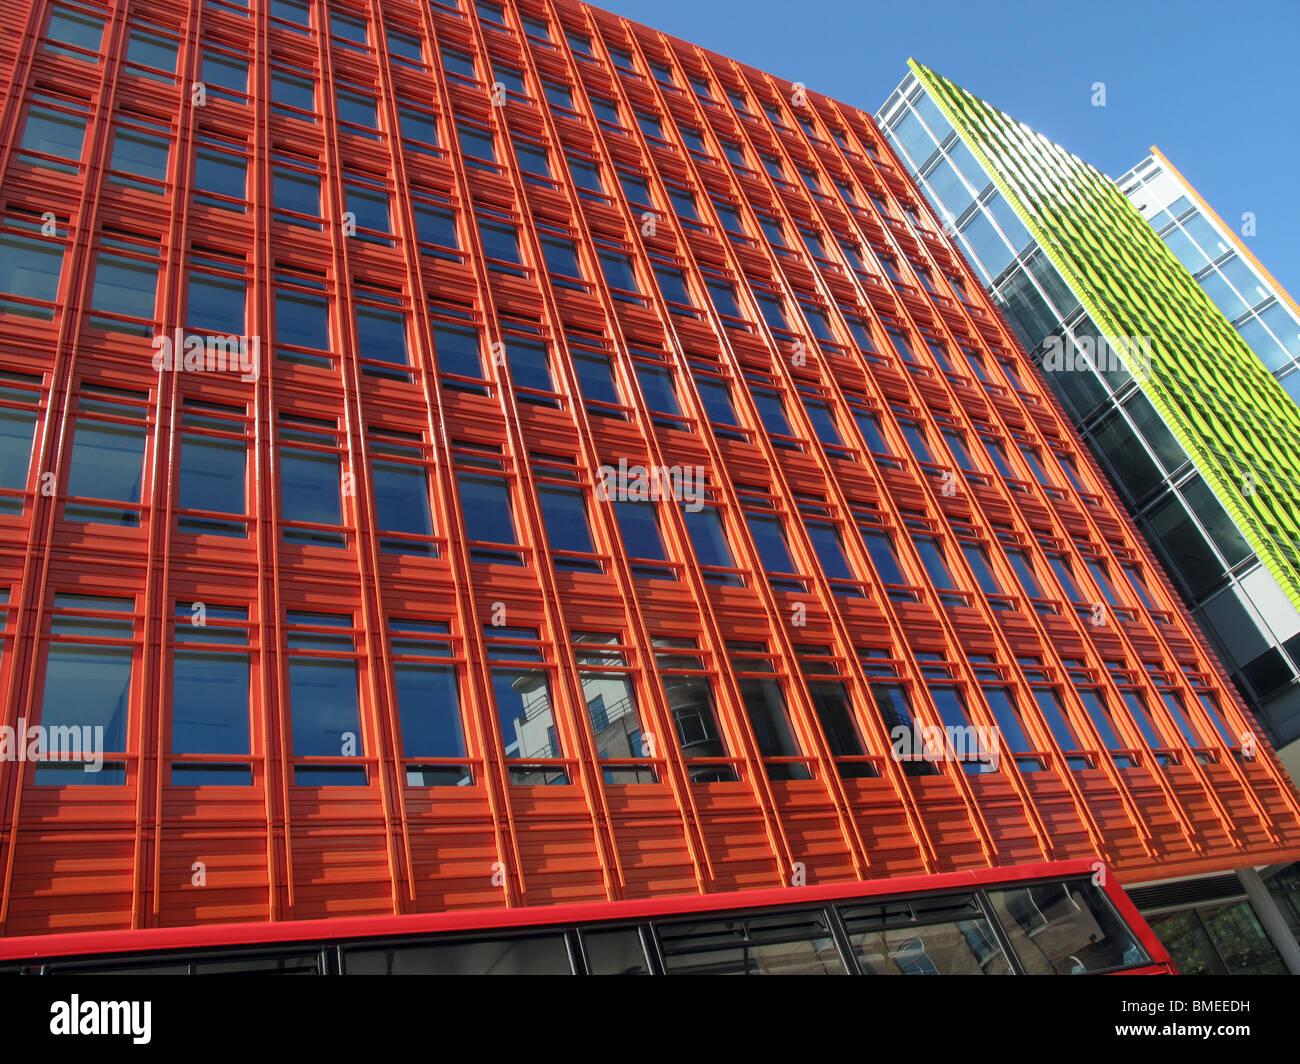 Central St Giles Architect Renzo Piano Architecture - Stock Image